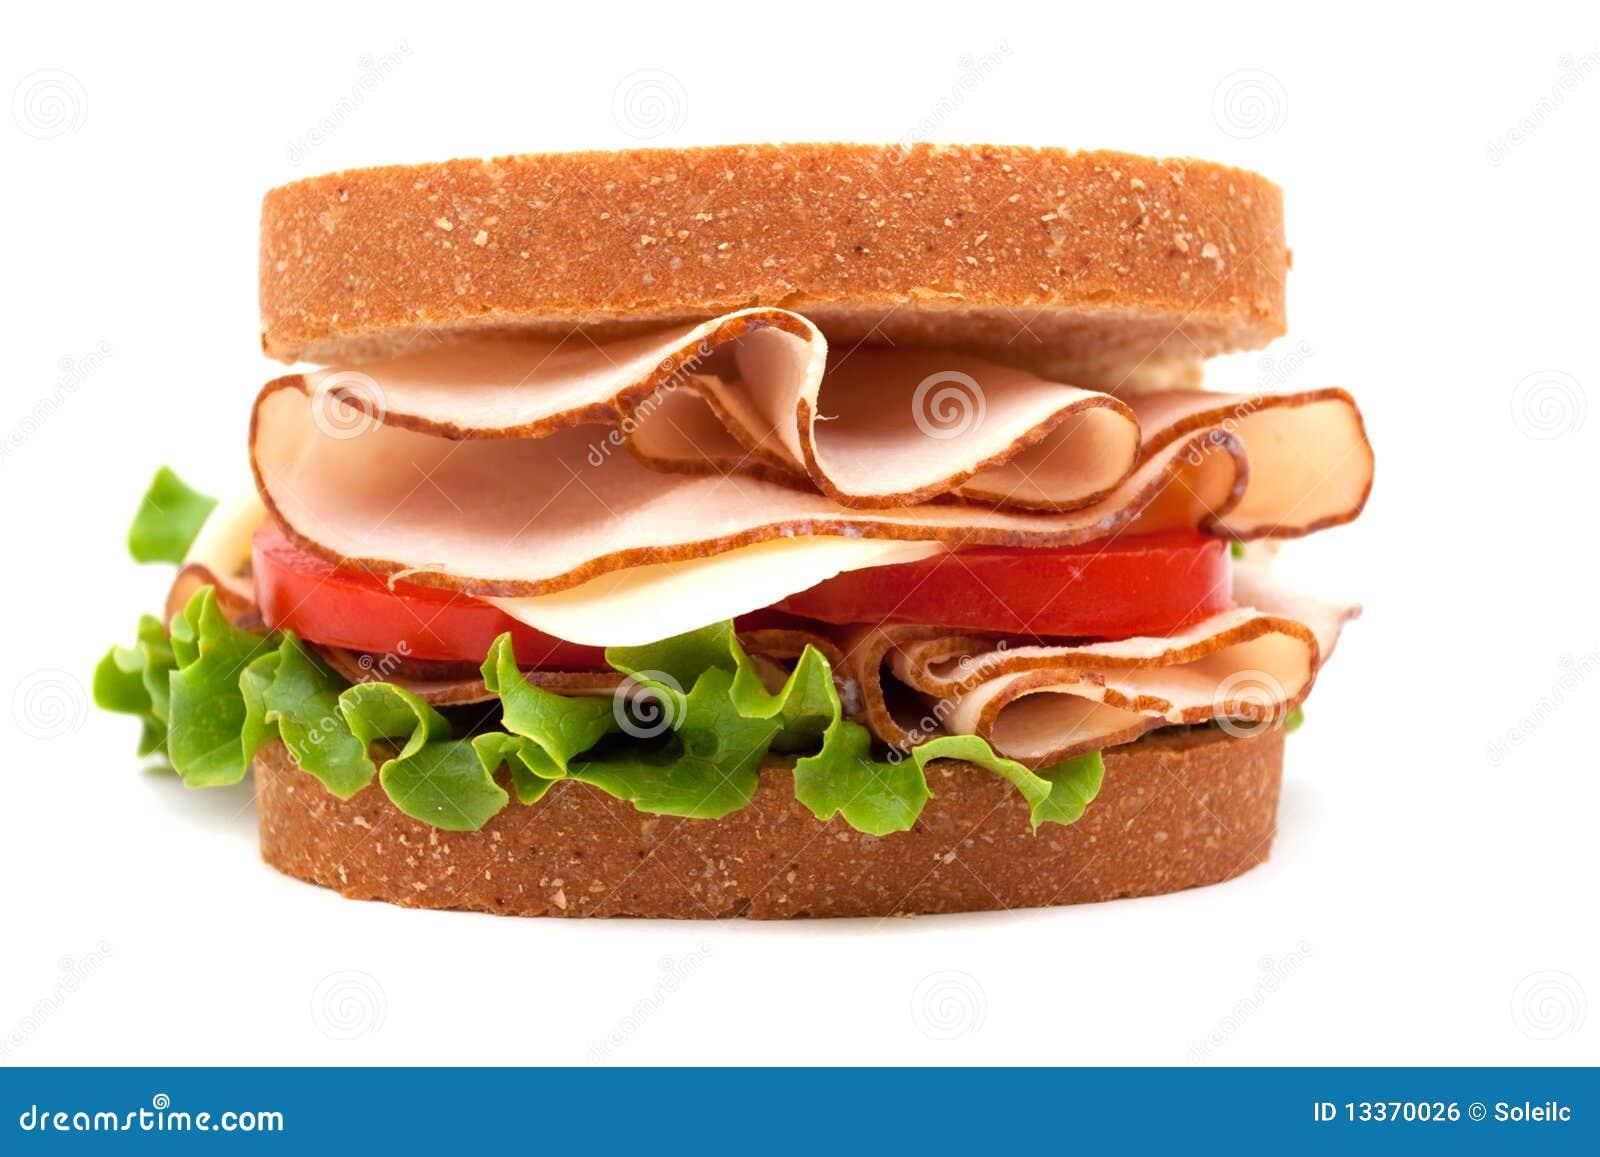 Turkey Sandwich On Wheat Bread Royalty Free Stock Image